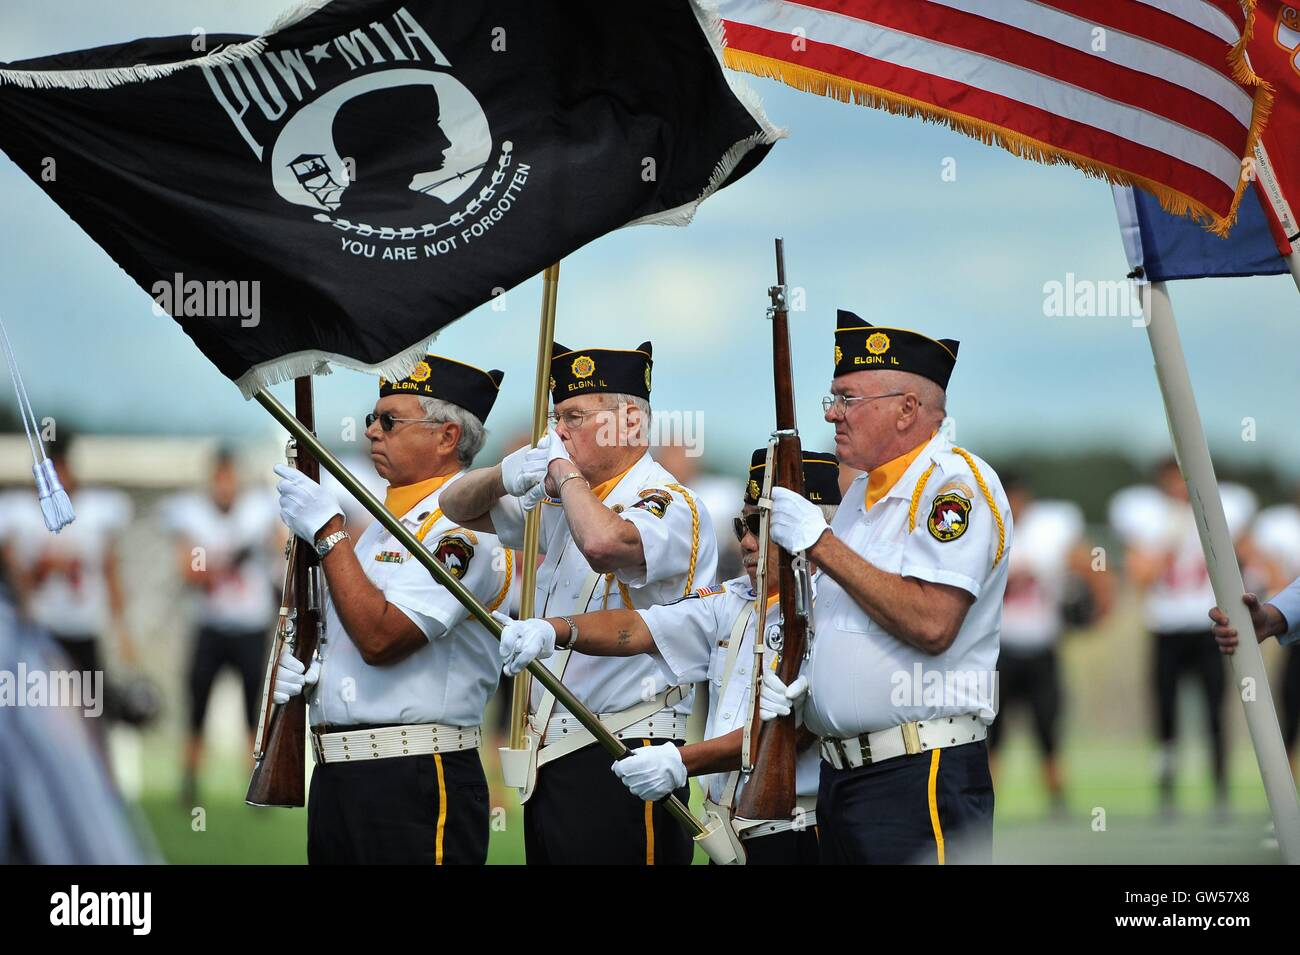 New POW MIA Beach Bath Pool Gift Towel Army Marines US Military Veteran American